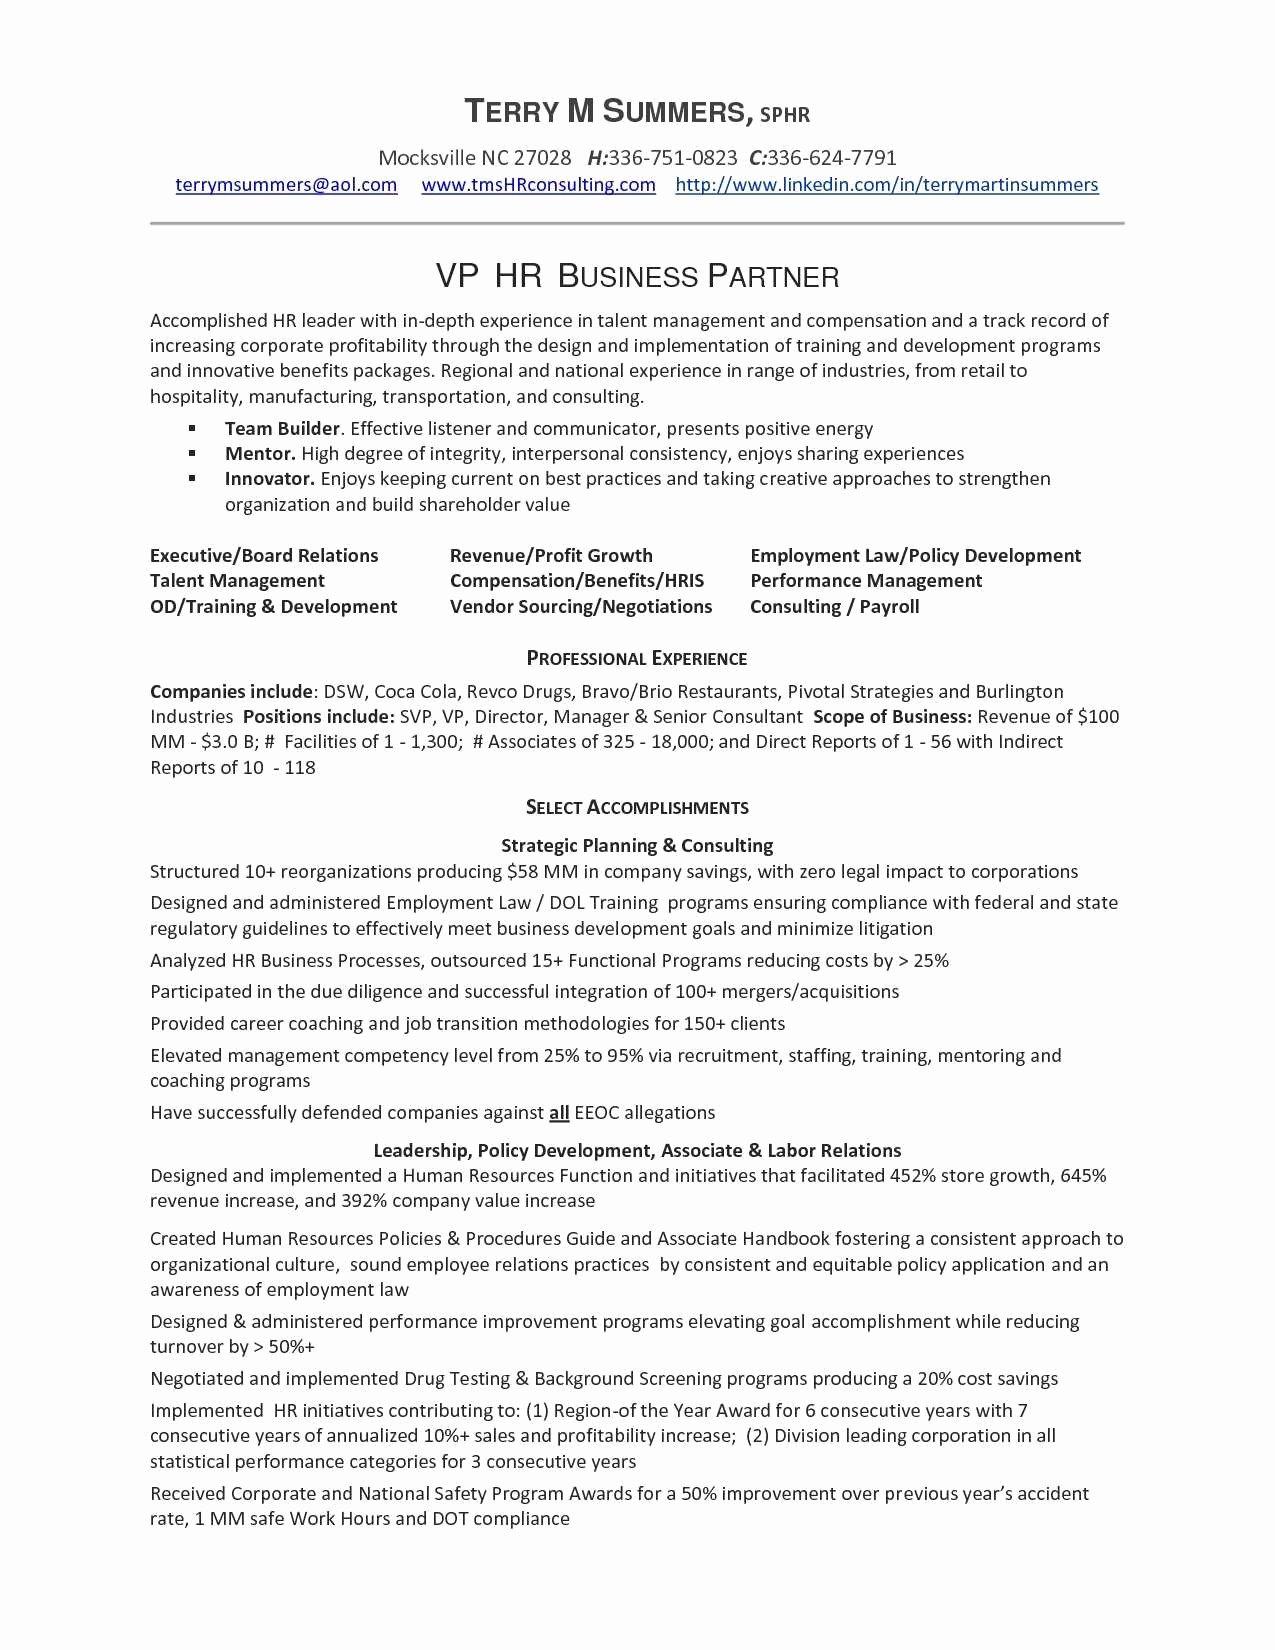 Business Collaboration Letter Sample Inspirational Business Collaboration Letter Template Collection